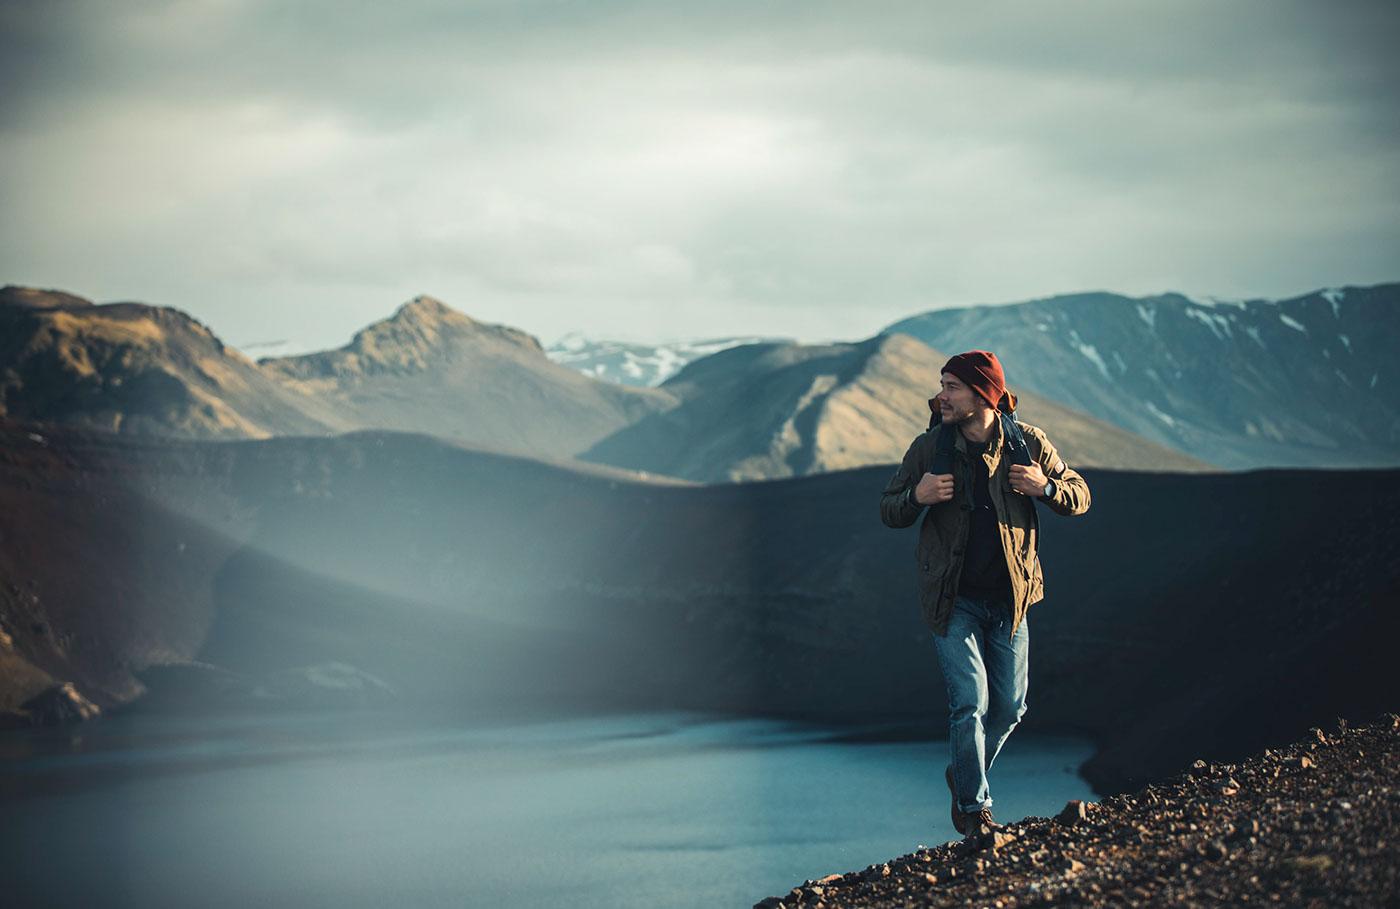 defender,Landscape,drone,Land Rover,adventure,Outdoor,lifestyle